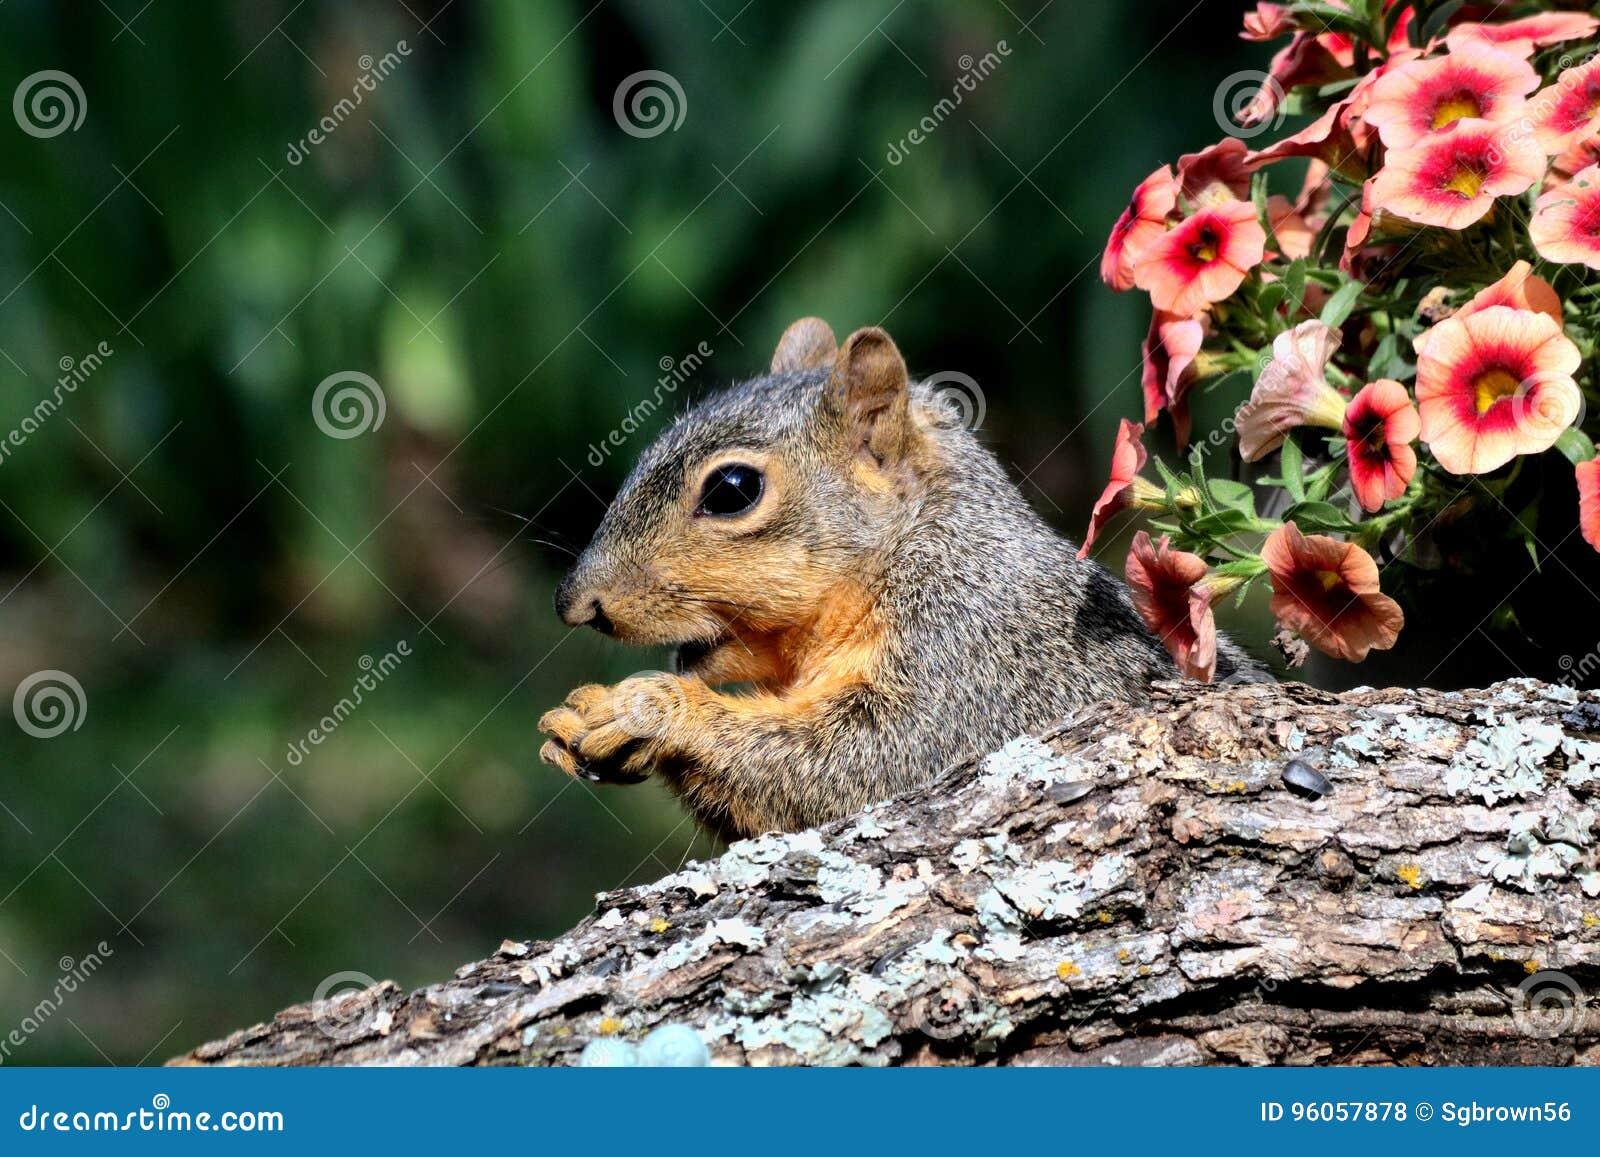 Écureuil semi-transparent